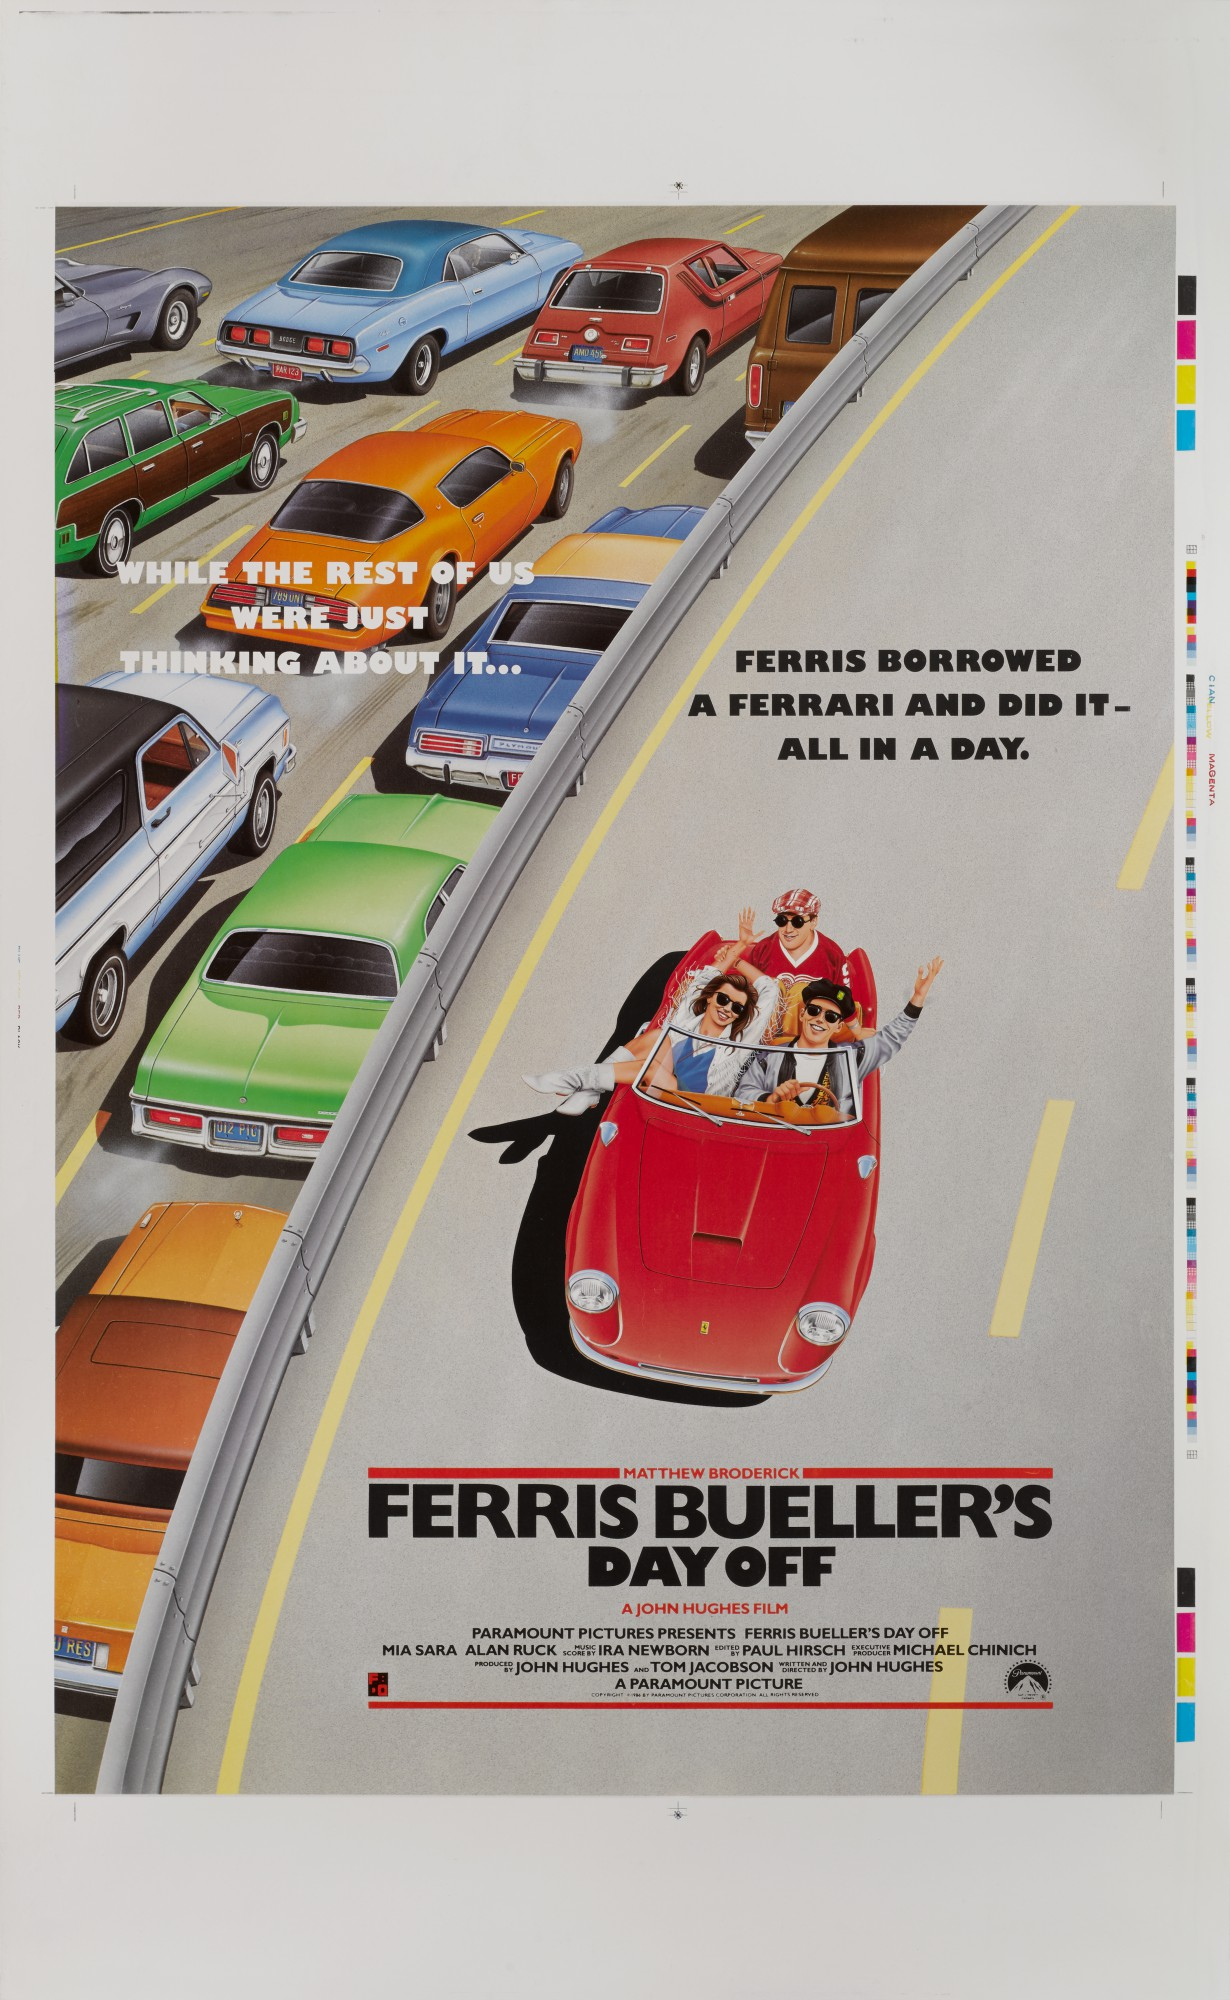 FERRIS BUELLER'S DAY OFF (1986) PRINTER'S PROOF, US